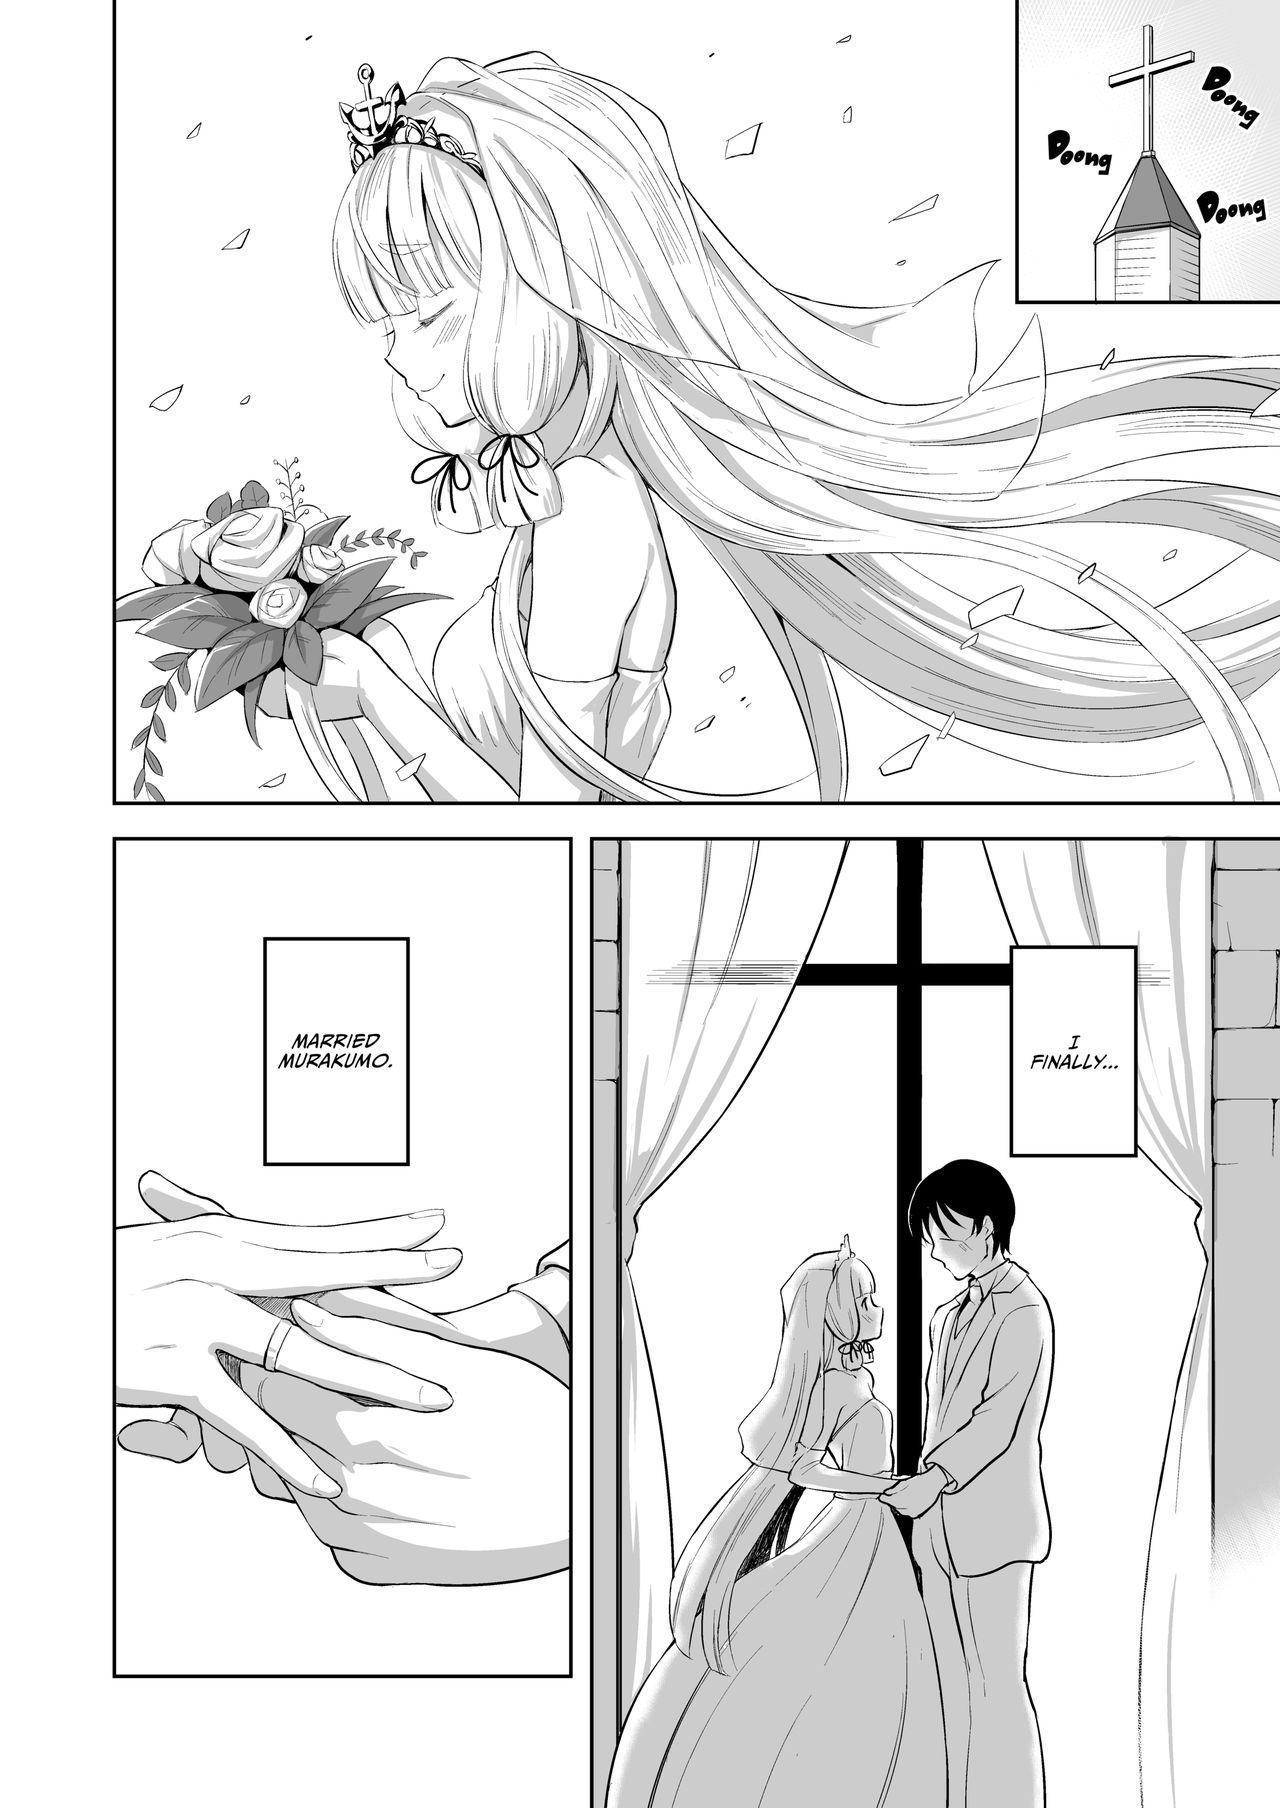 Murakumo to Kozukuri SEX | Impregnating Murakumo 2